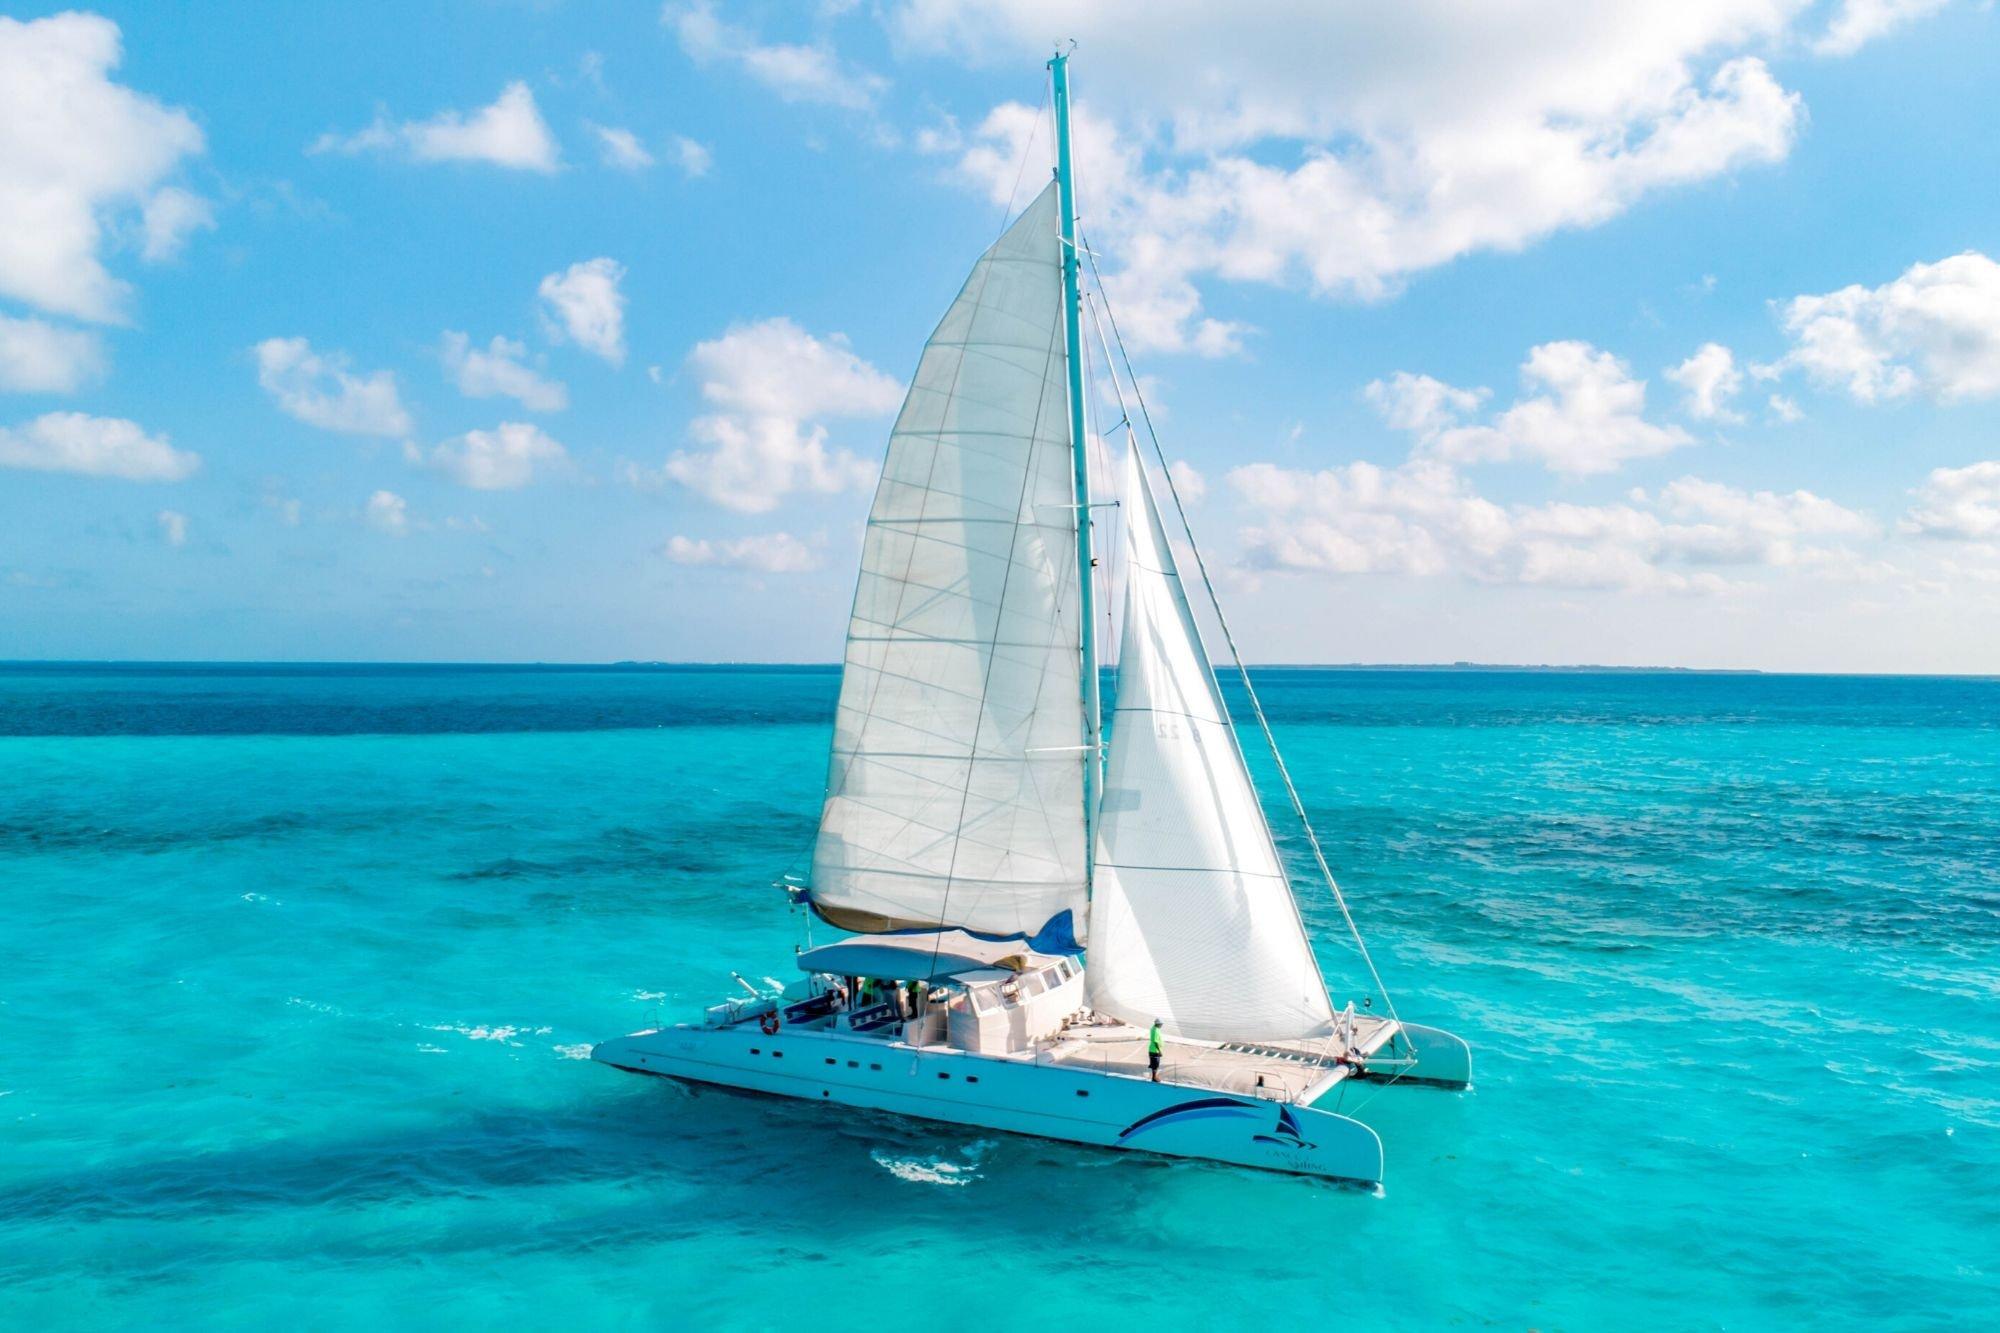 5 - HiRes - Sea Passion III - Isla Mujeres Catamaran Tour - Cancun Sailing